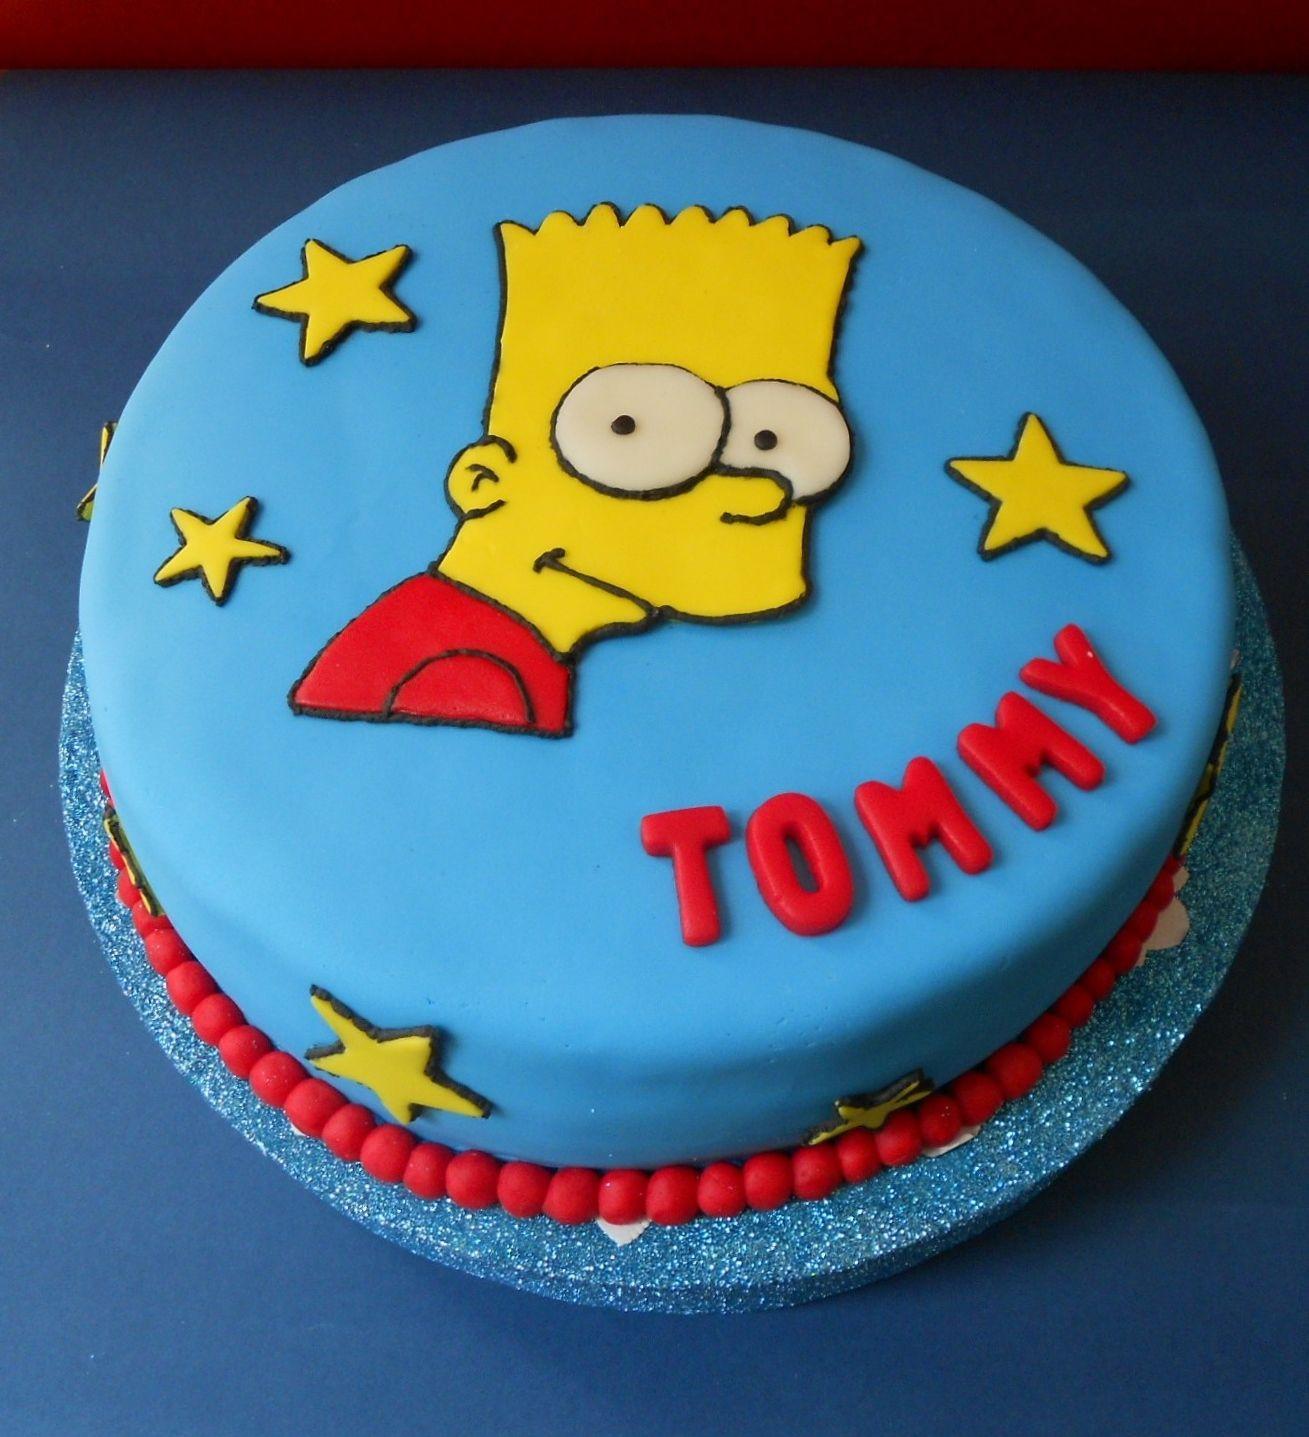 Bart Simpson Cake by Violeta Glace | Aroa | Pinterest | Geburtstage ...